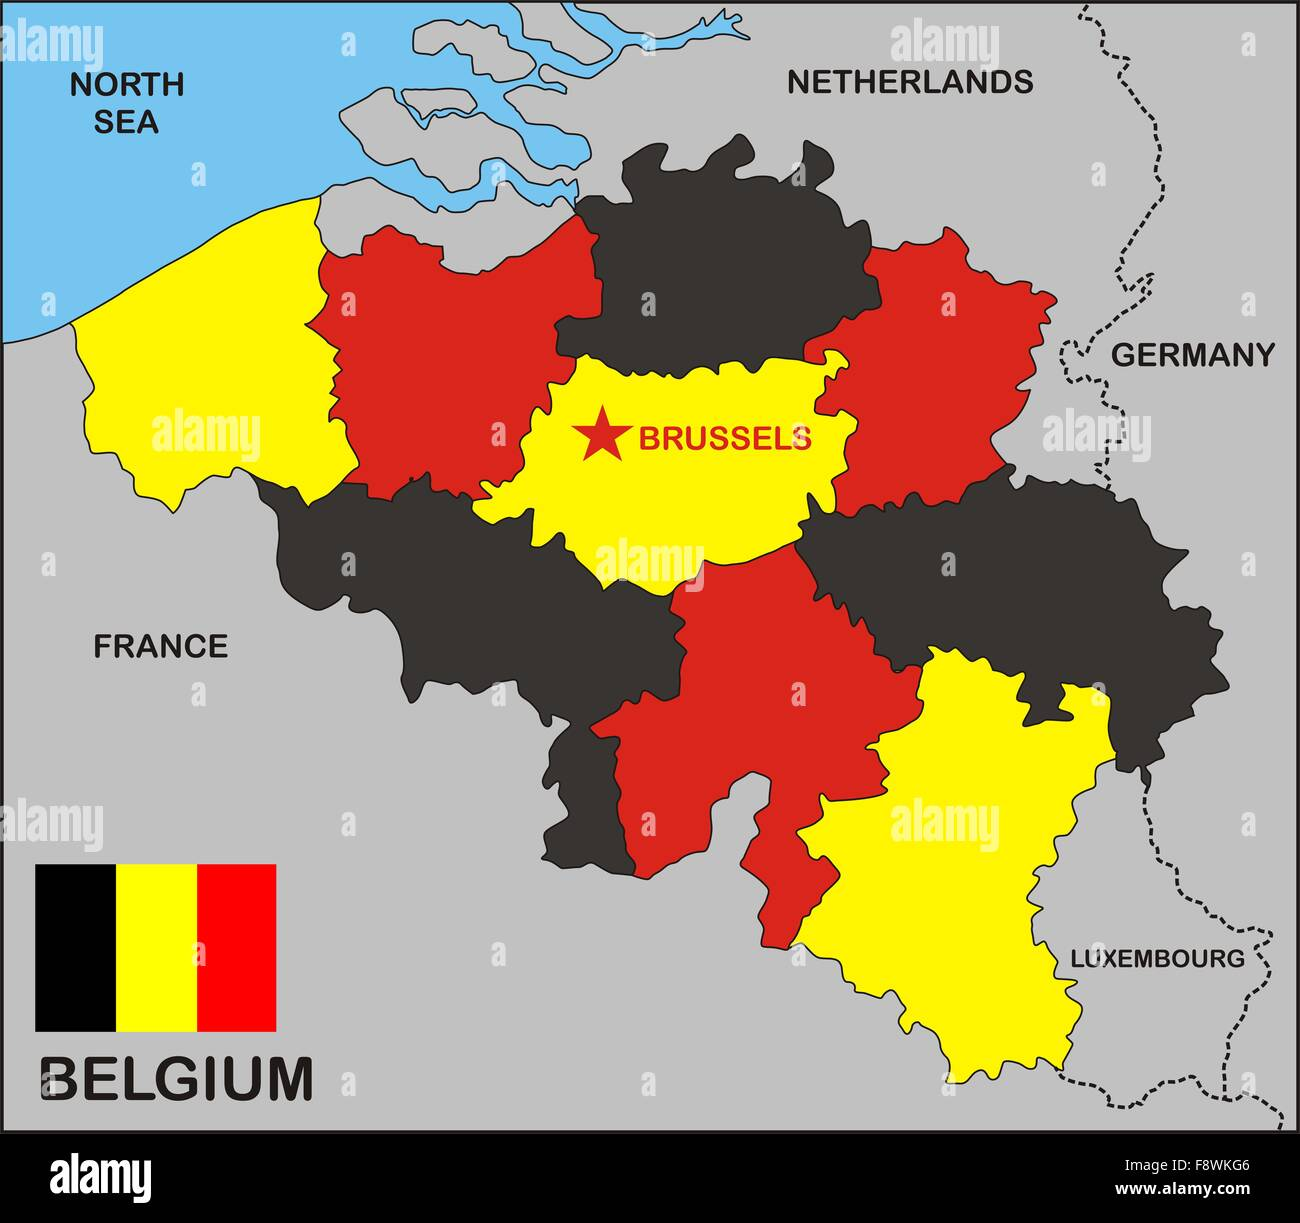 Cartina Belgio Politica.Belgium Political Map Stock Photo 91533238 Alamy